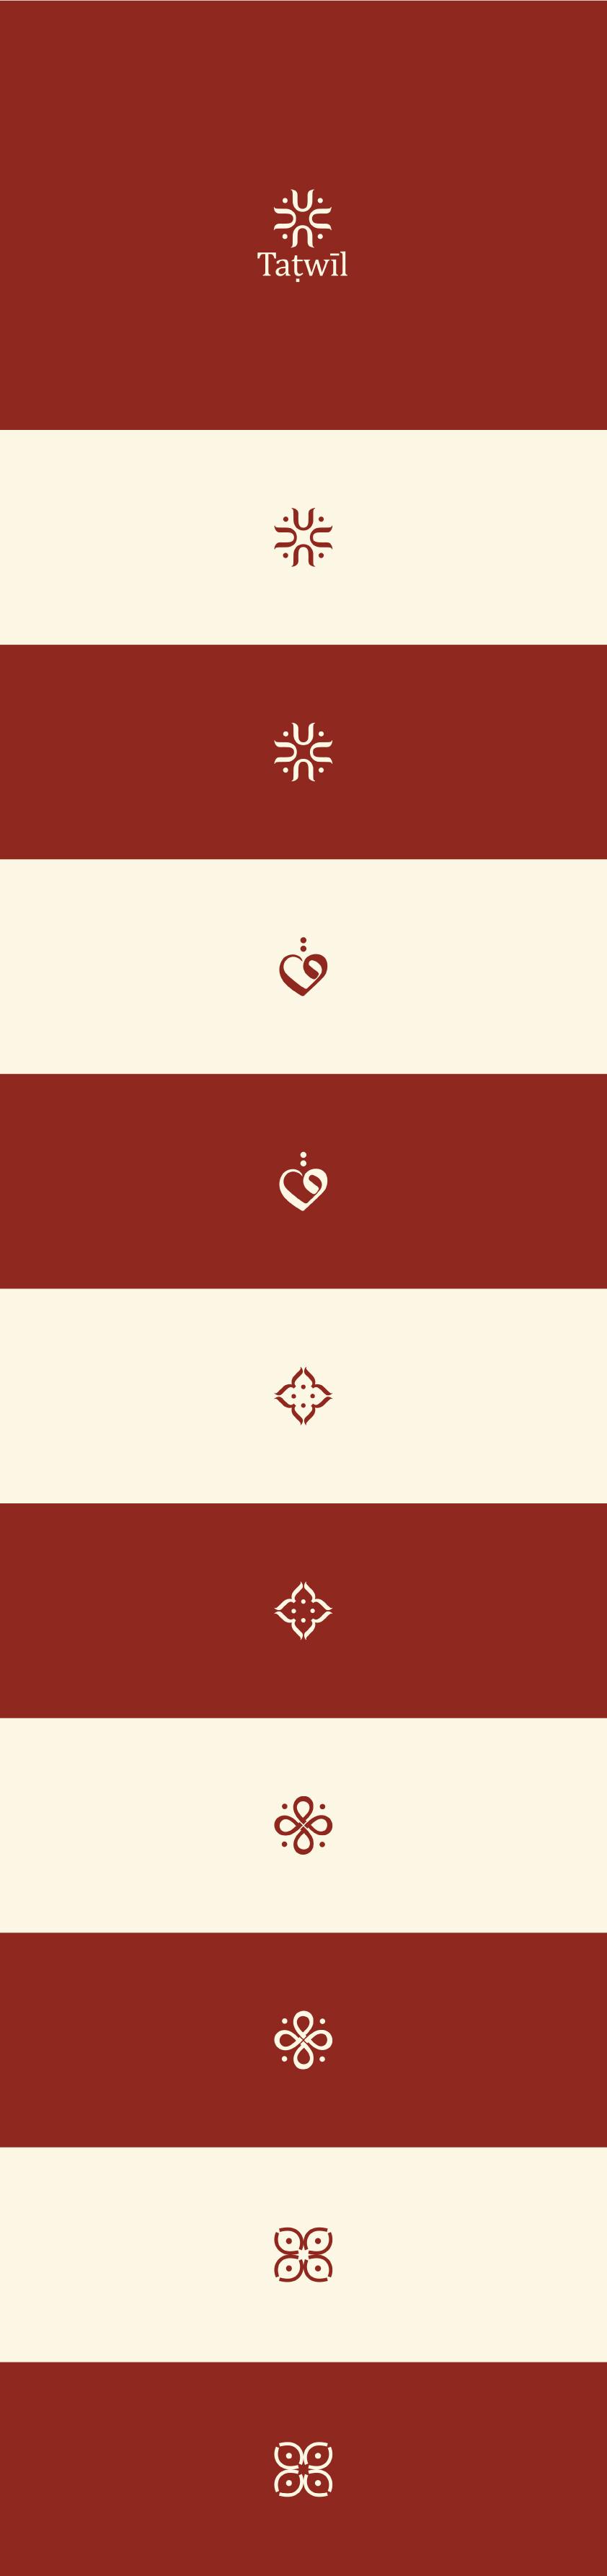 #brandimage #Design #icons #graphicDesign